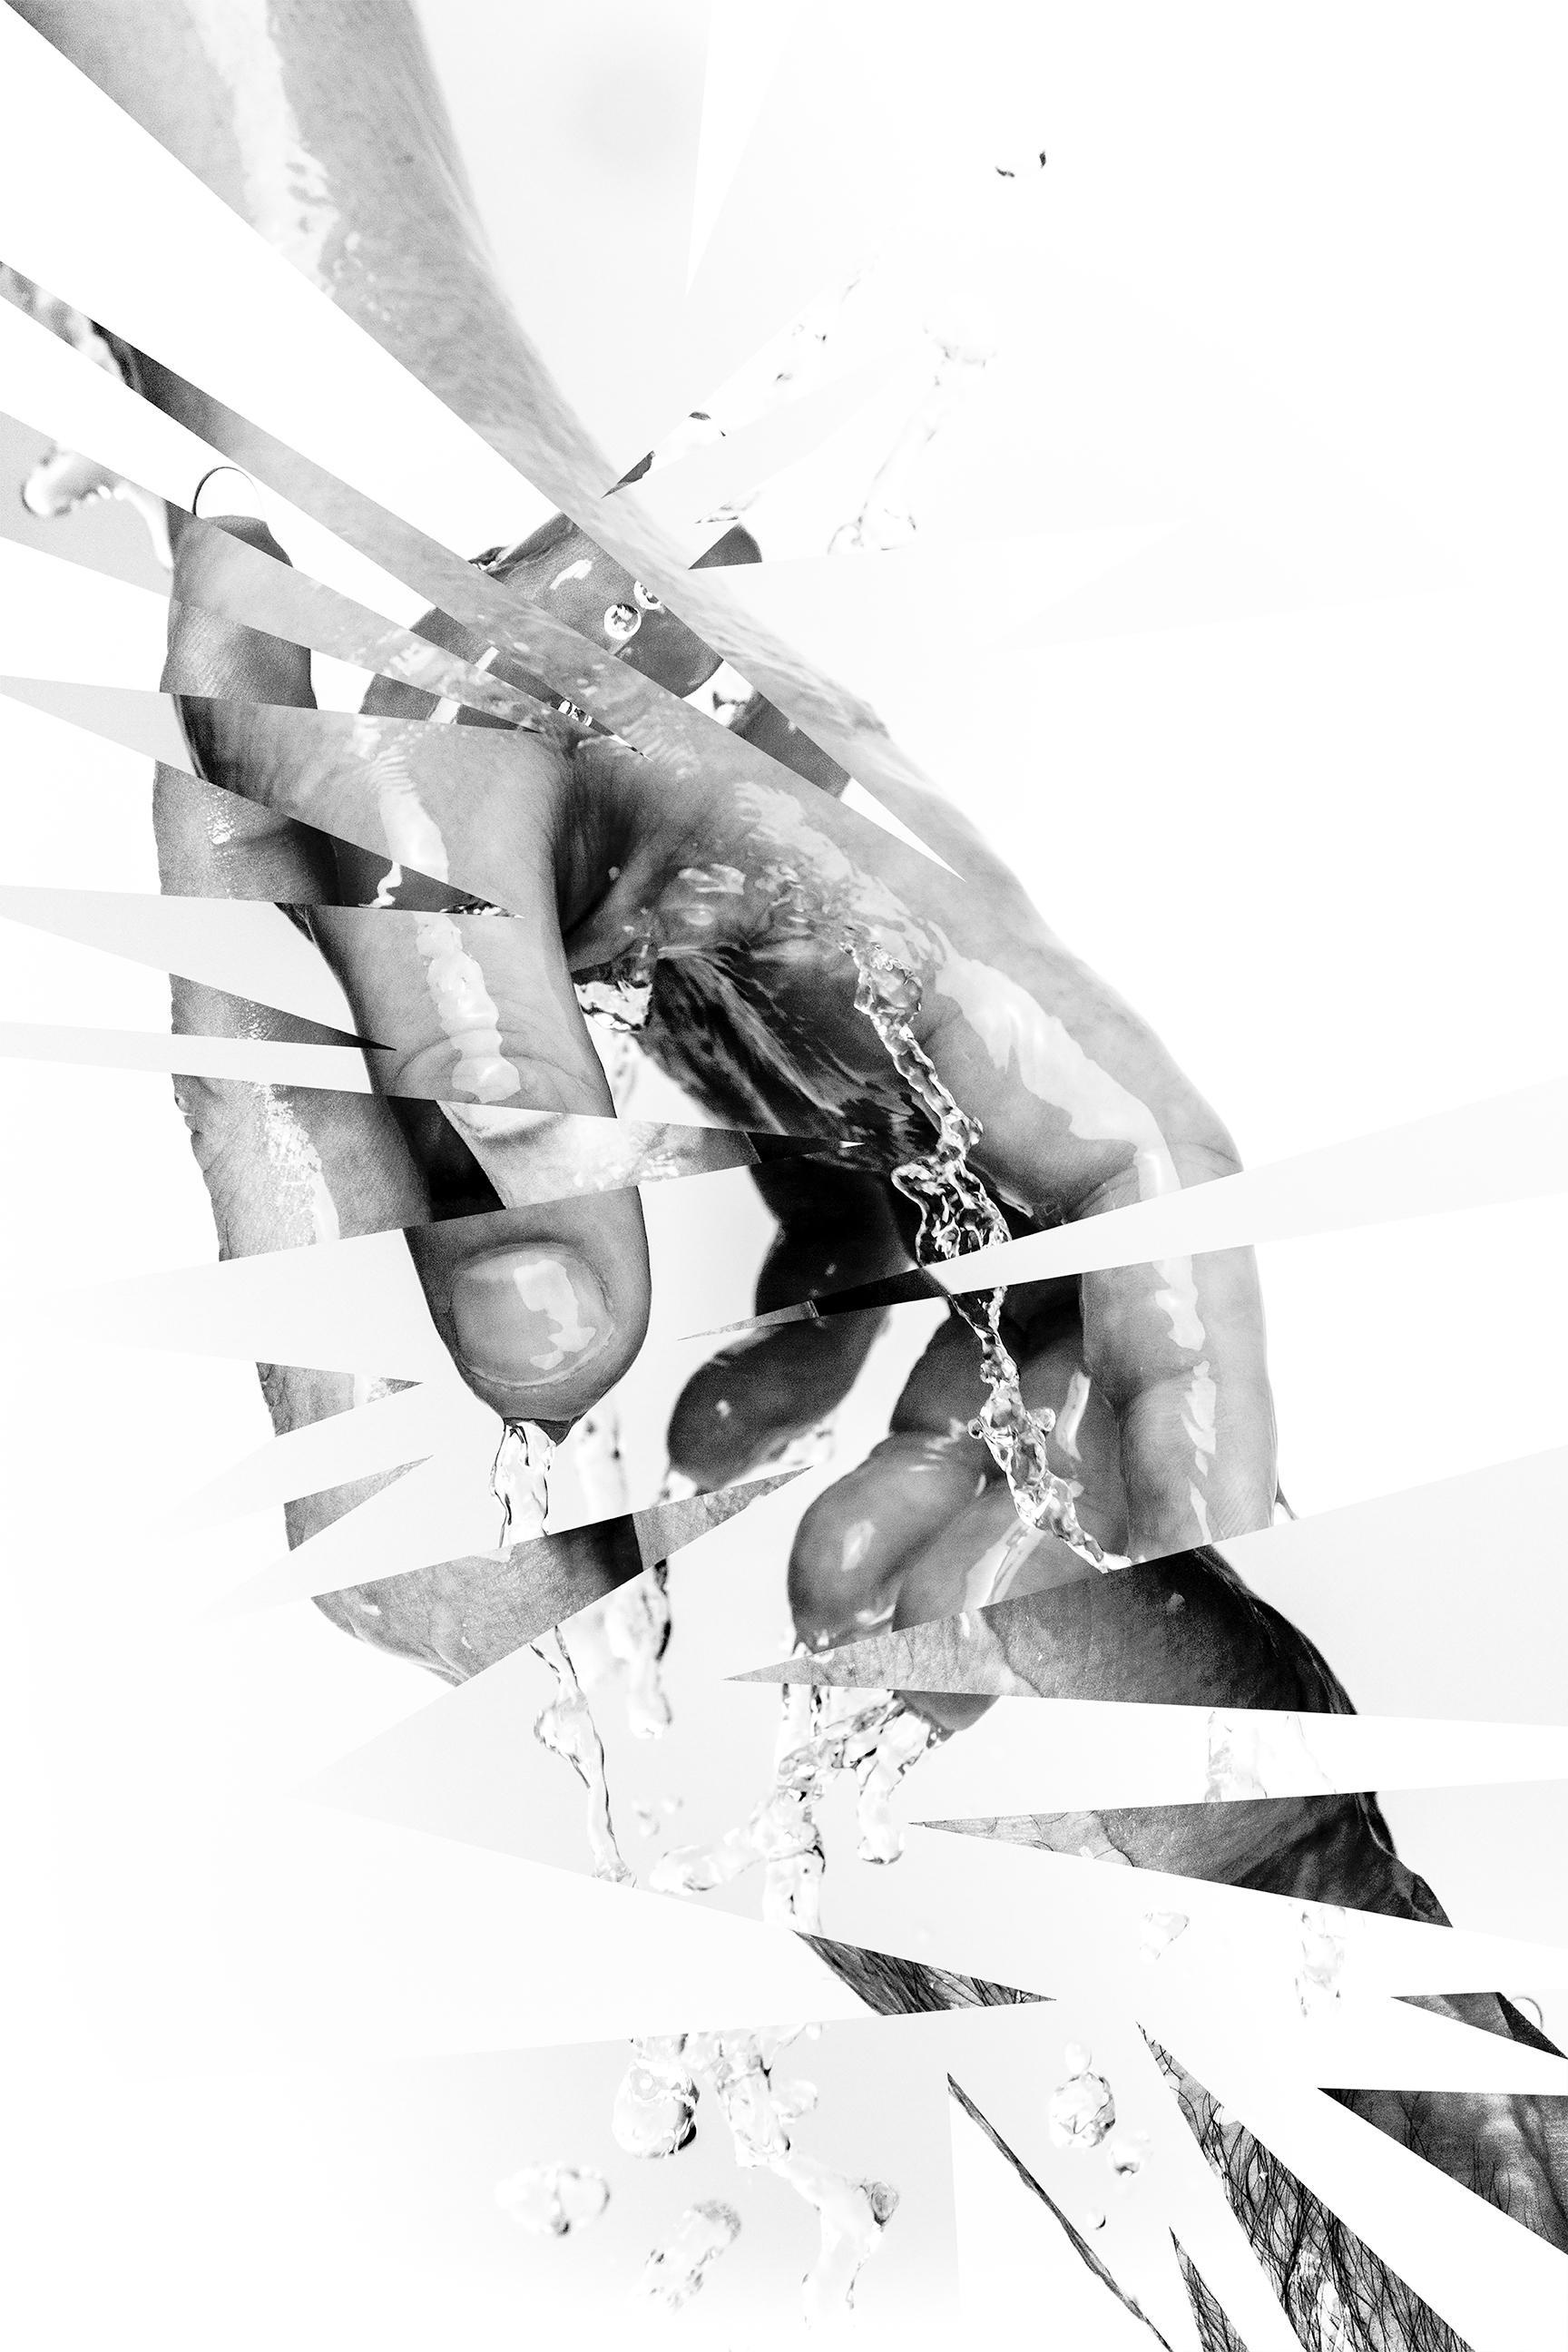 The_Hand_Water_Web_Combine.jpg